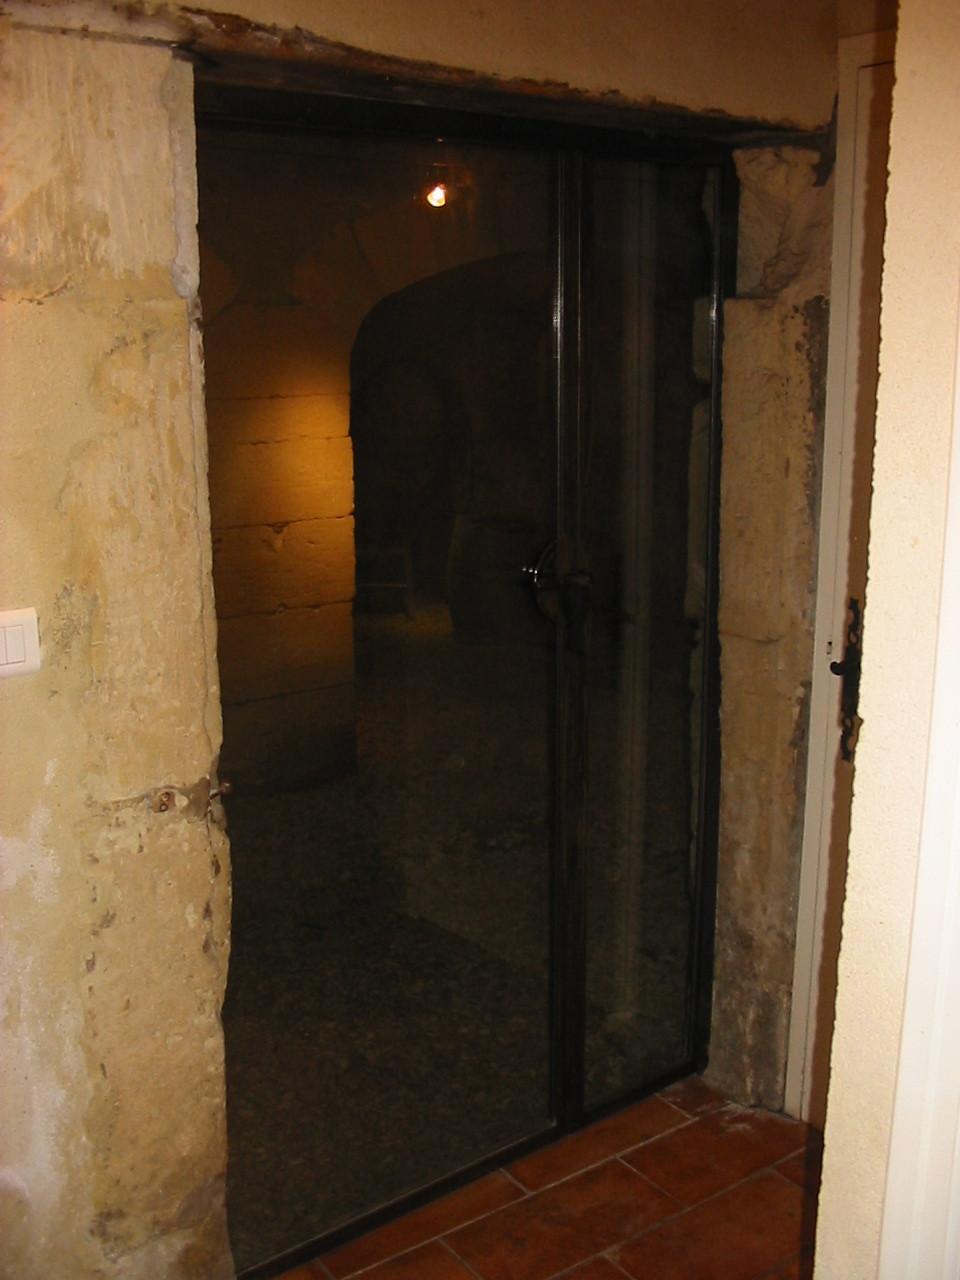 Porte de cave vins fullmetalart for Porte cave